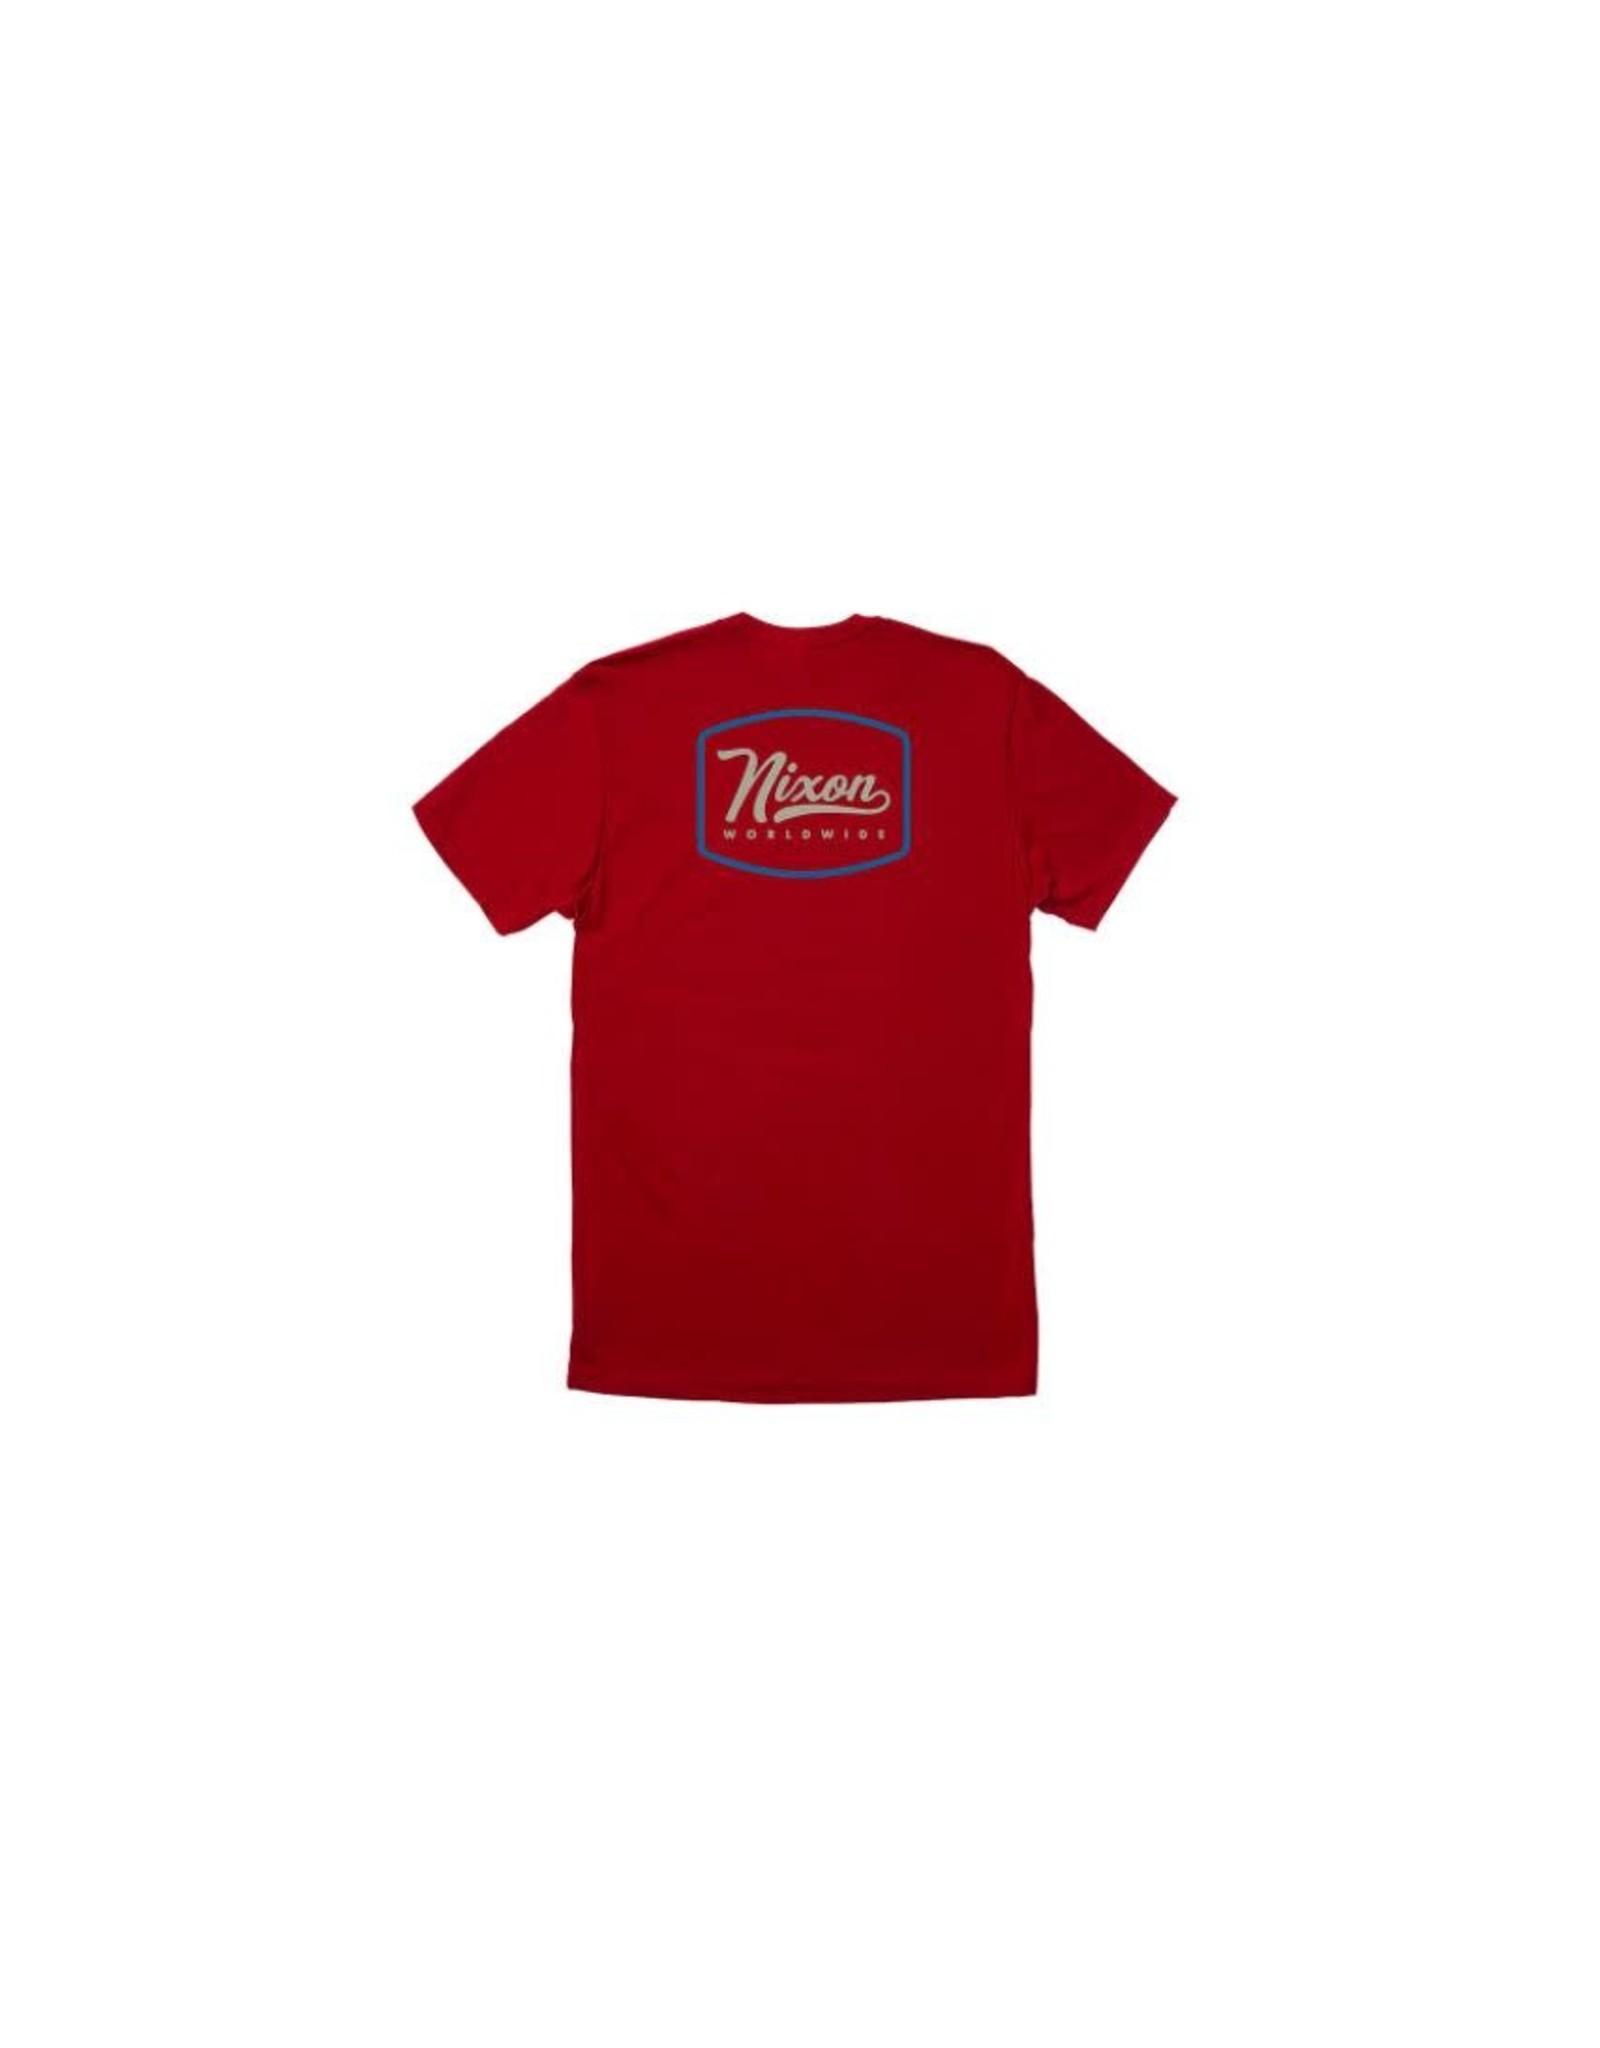 nixon Nixon - T-shirt homme looped cardinal